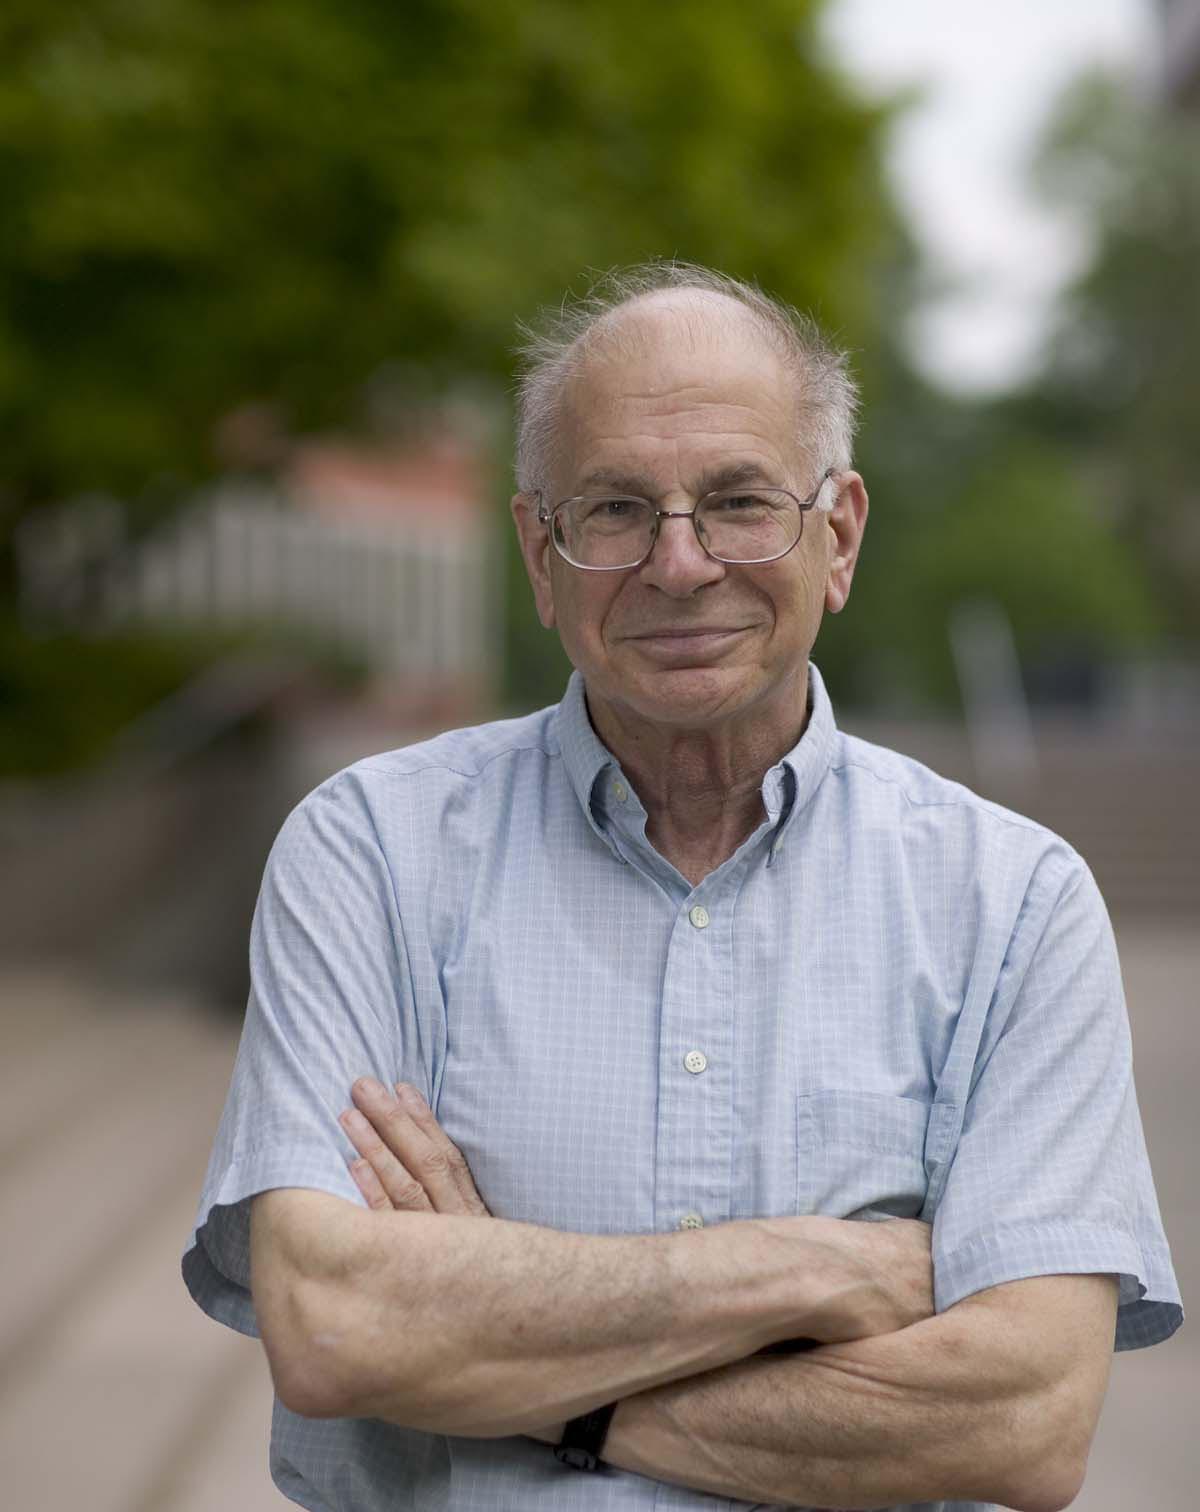 Daniel Kahneman Nobel Prize Winning Psychologist